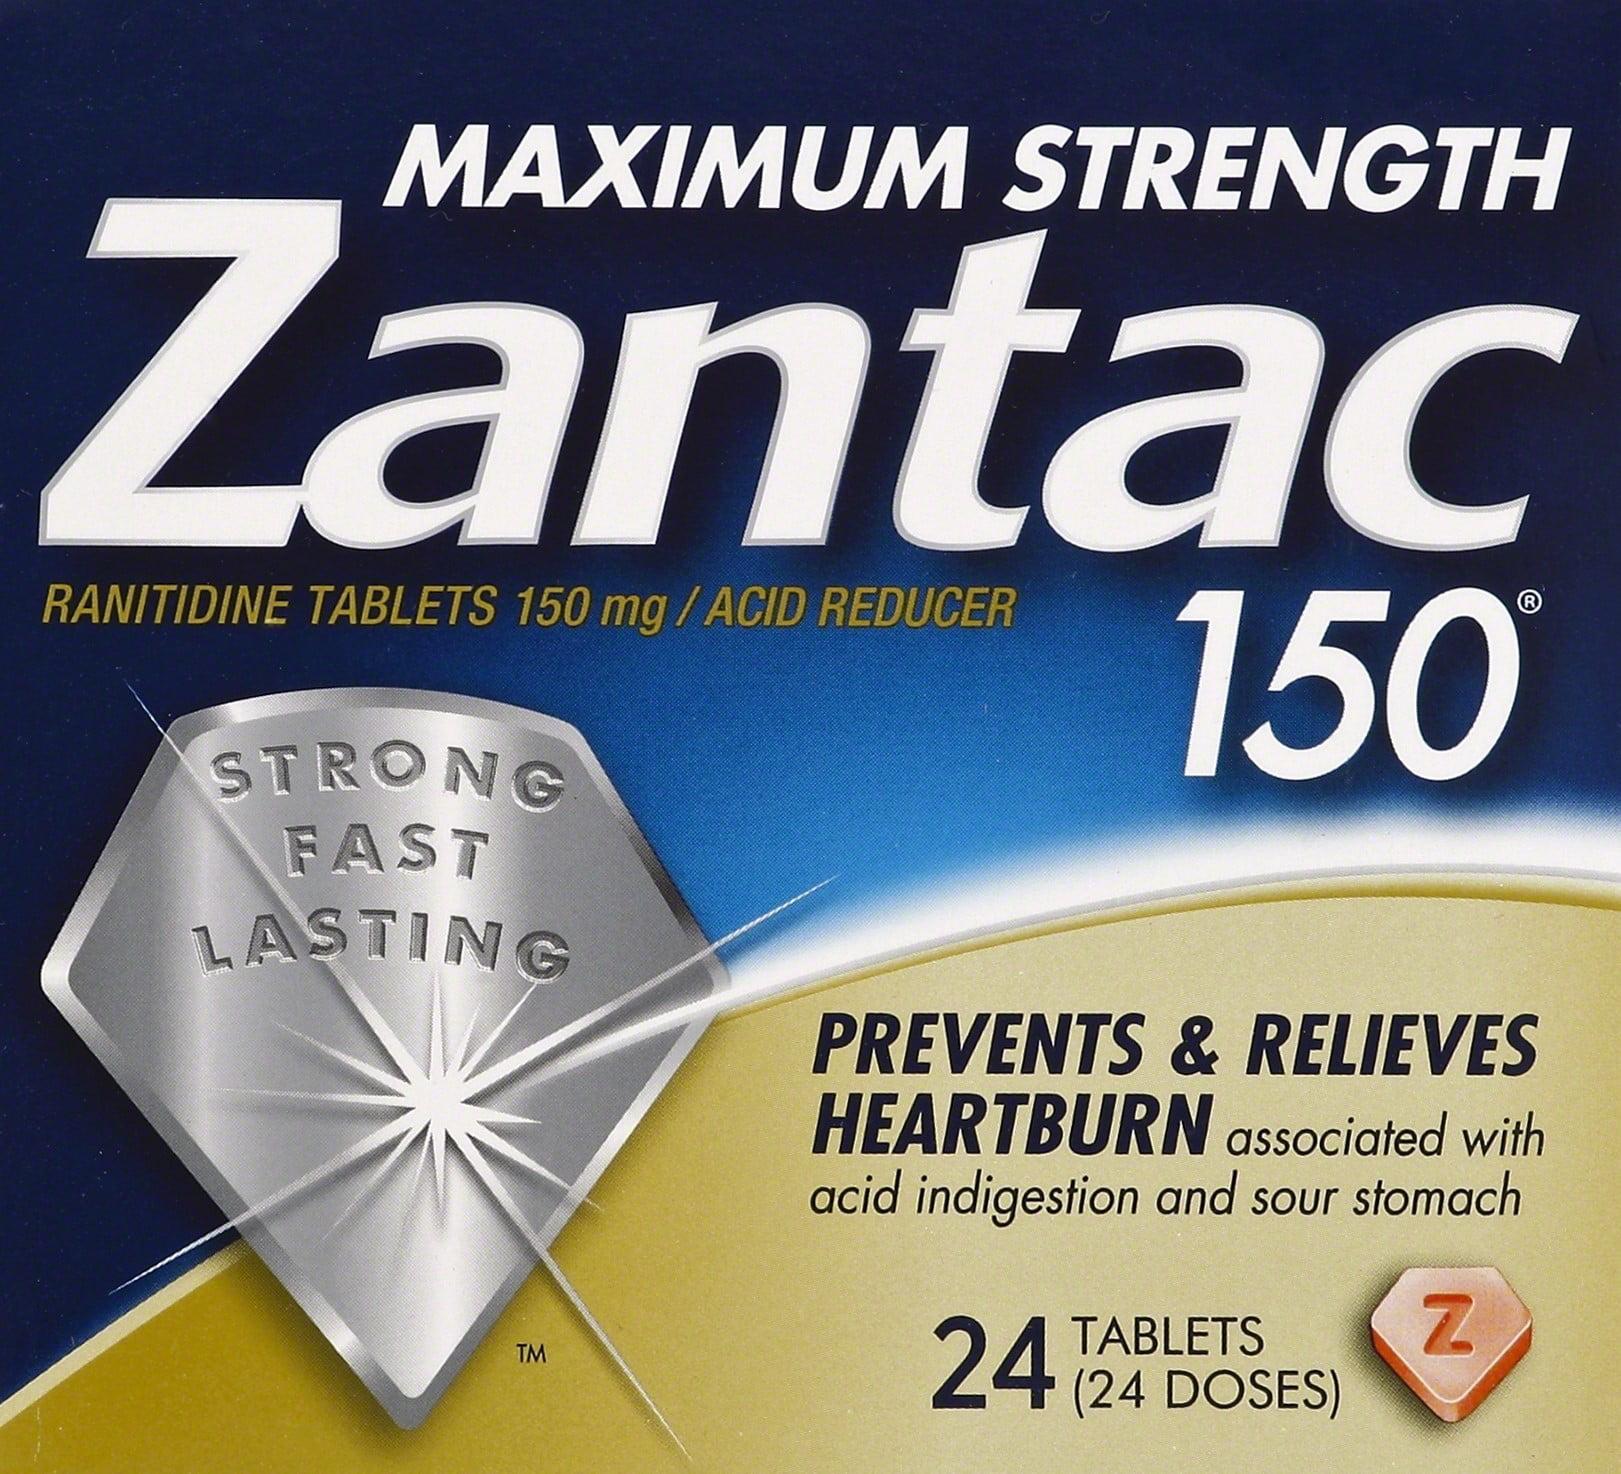 Zantac 150mg Maximum Strength Ranitidine / Acid Reducer Tablets, 24ct